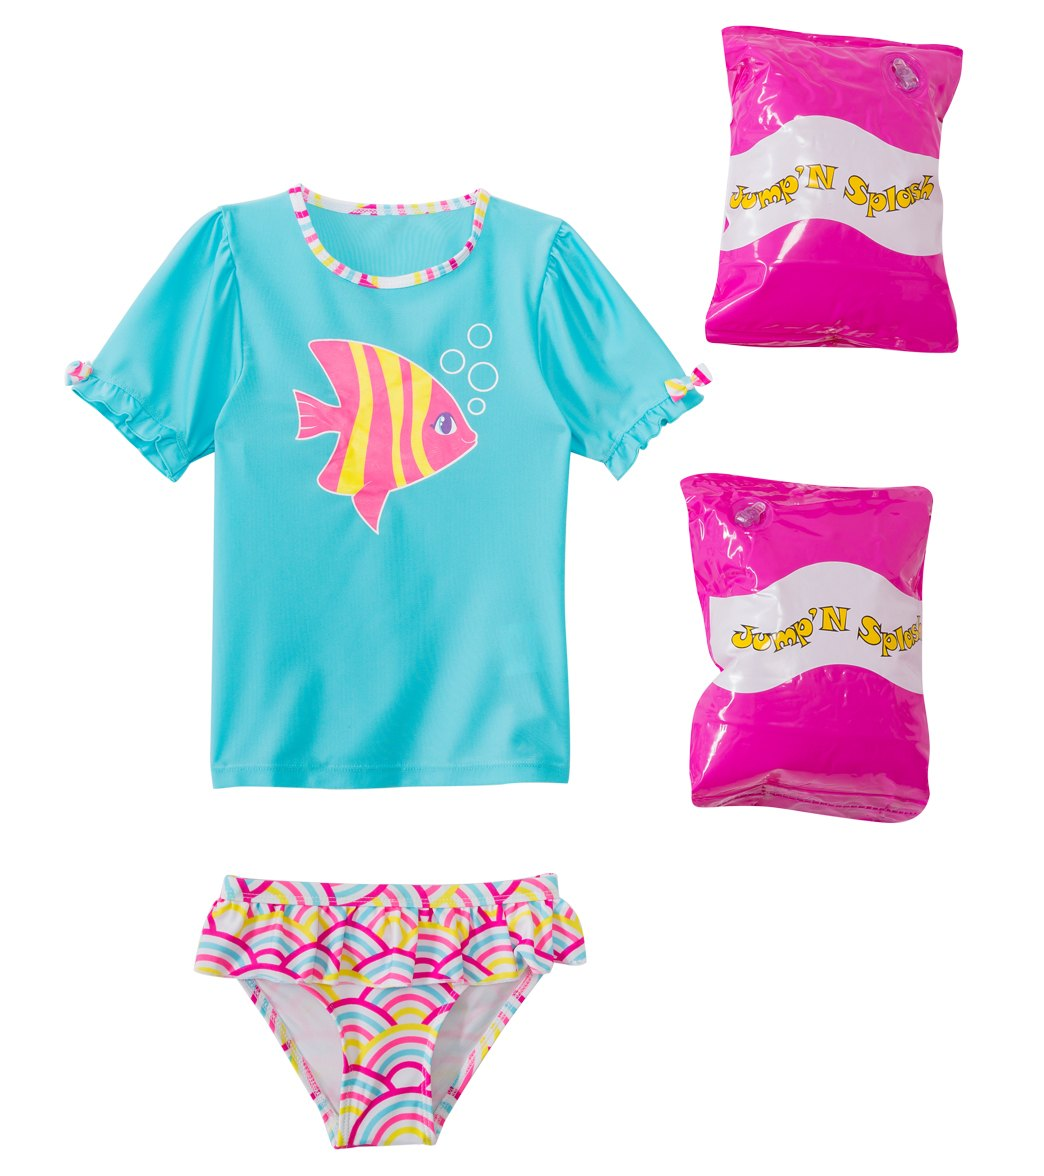 2c9a30be09 Jump N Splash Toddler Girls' Wish Fish Two-Piece Short Sleeve Rashguard Set  w